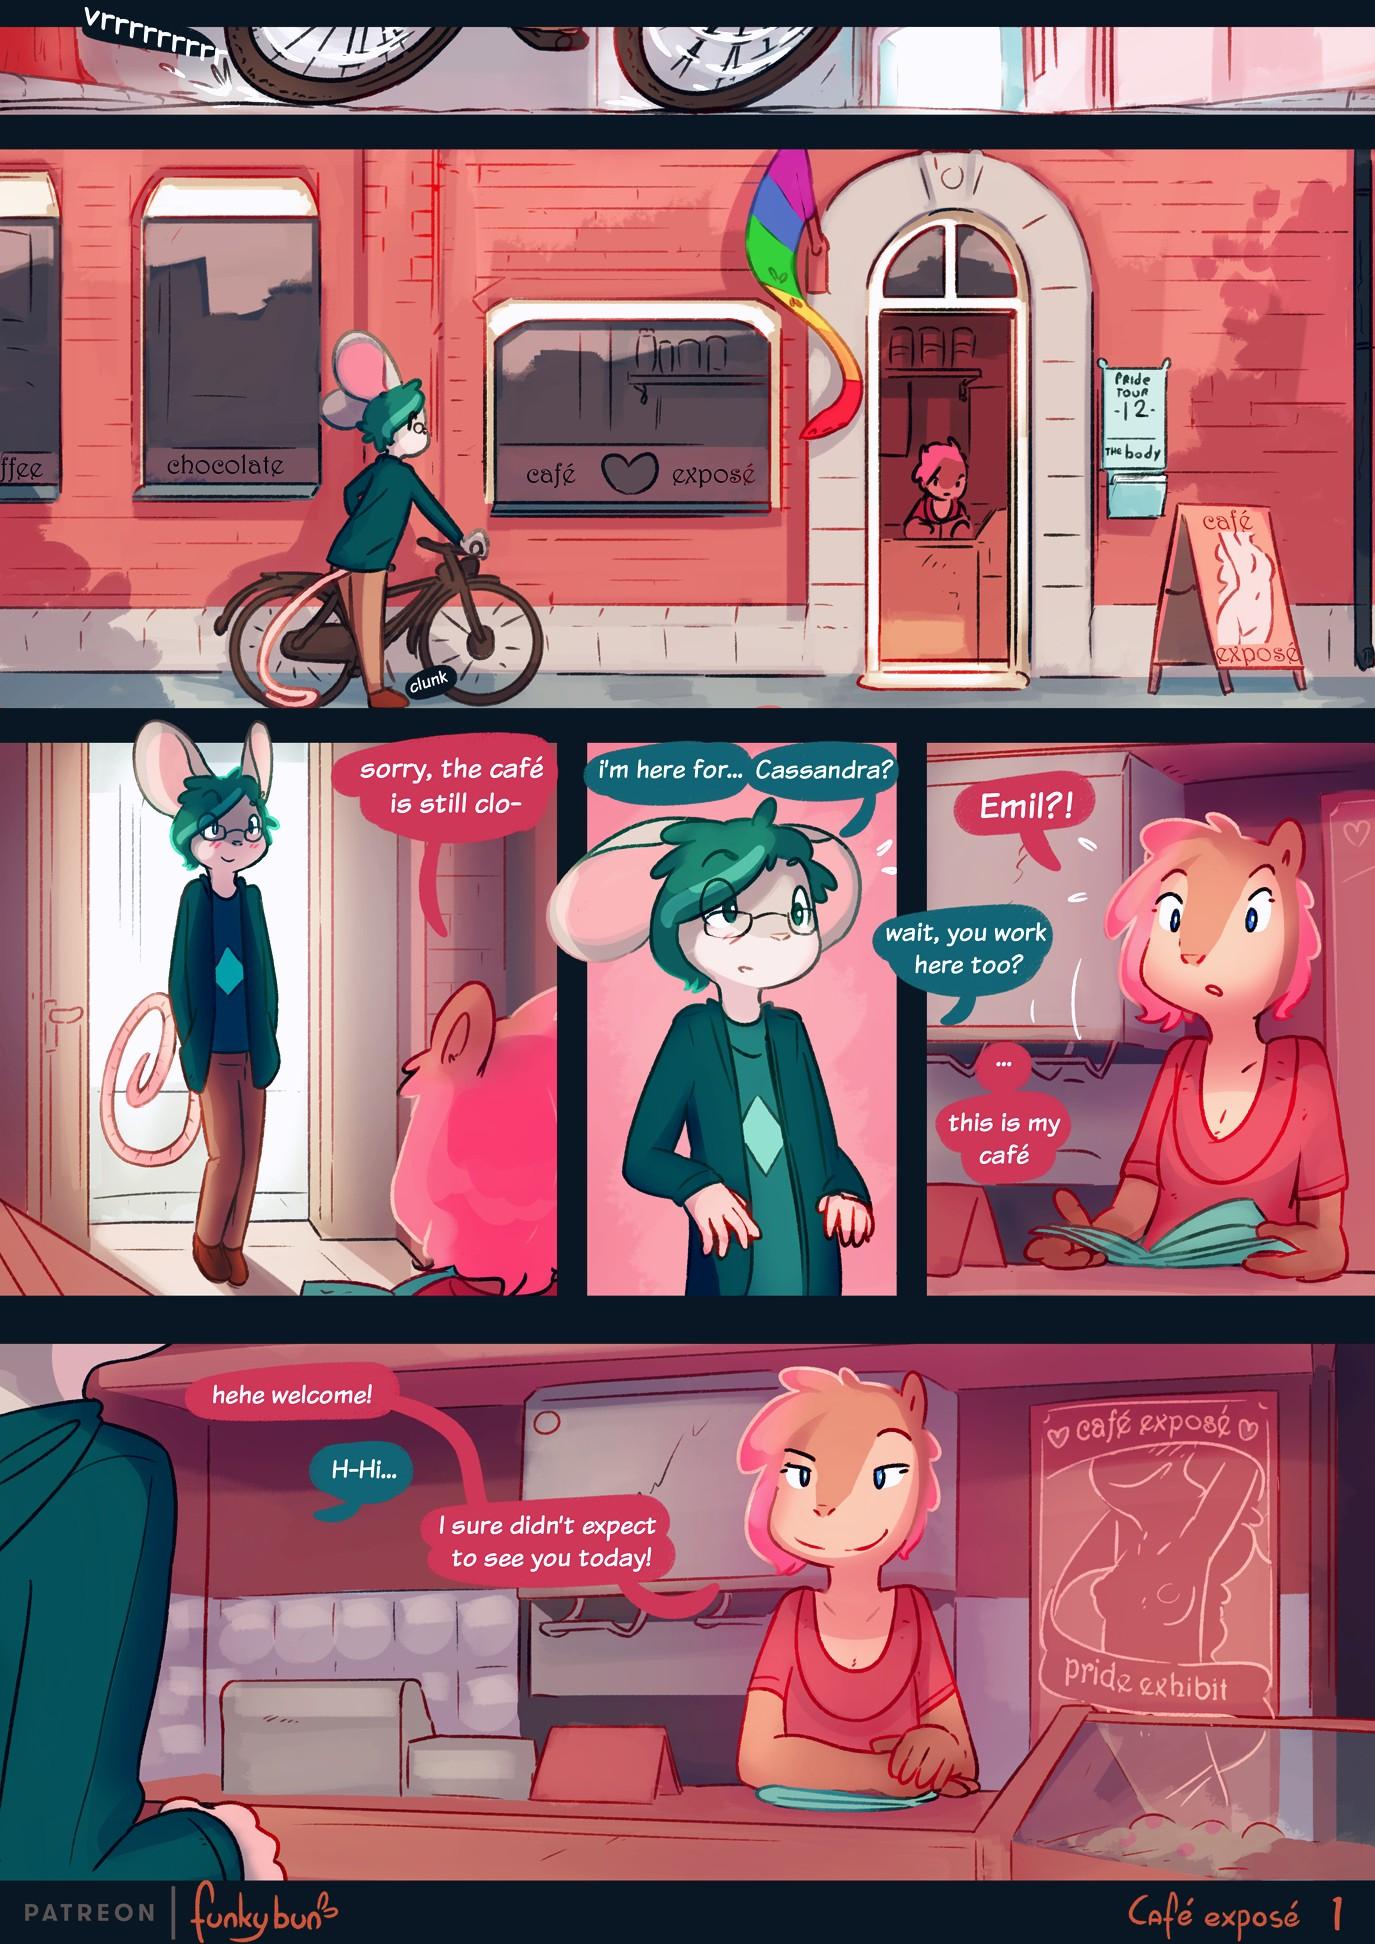 Café exposé furry porn comic page 01